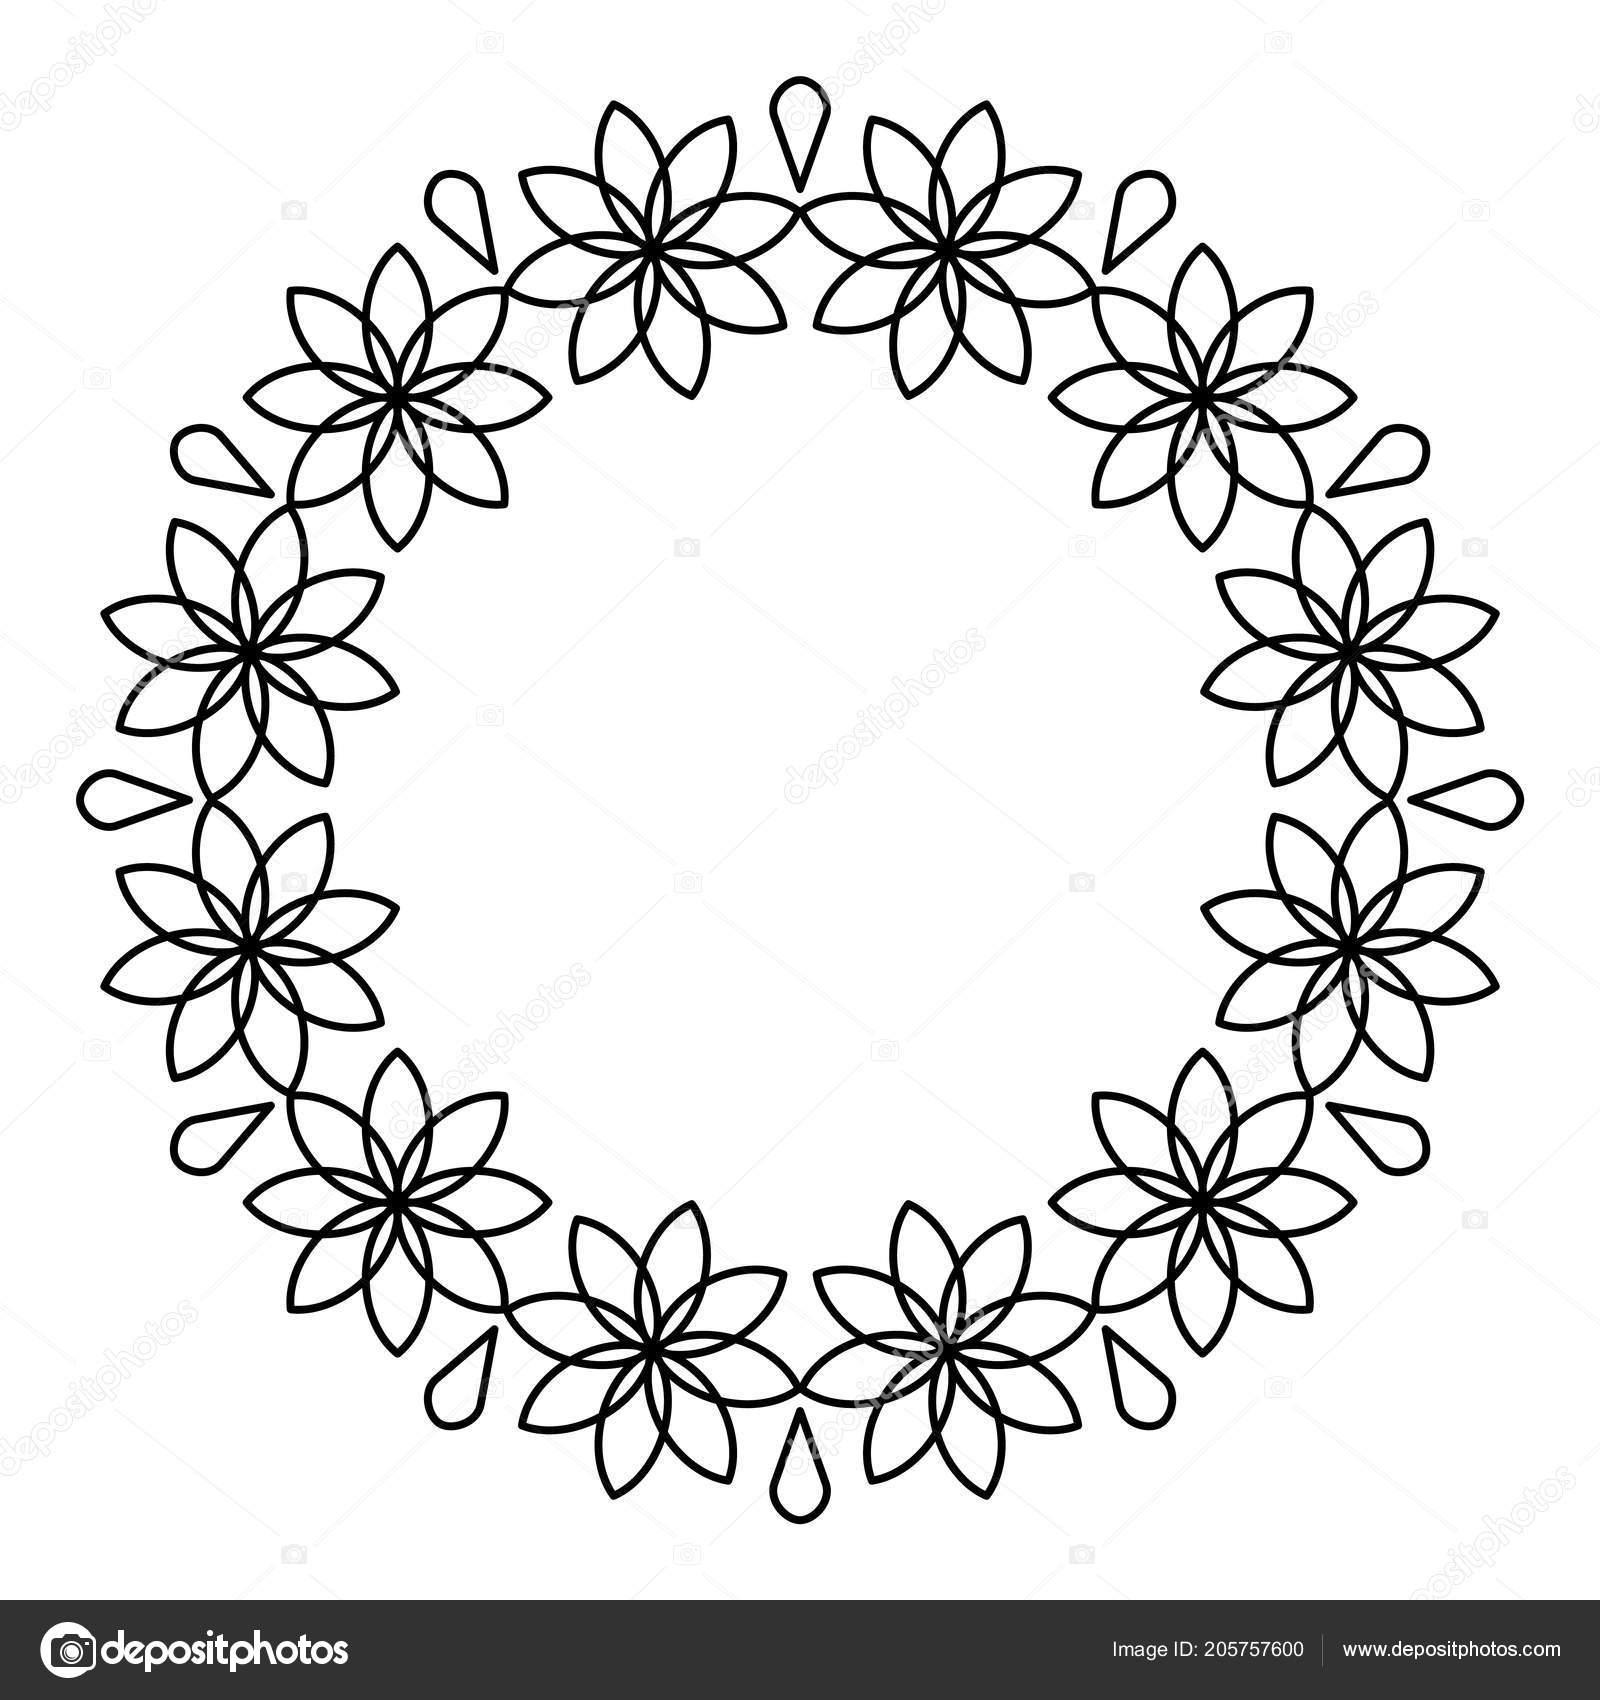 Photo Frame Outline Design Outline Flowers Circle Frame Design Monochrome Floral Border Stock Vector C Petra Id Hotmail Com 205757600